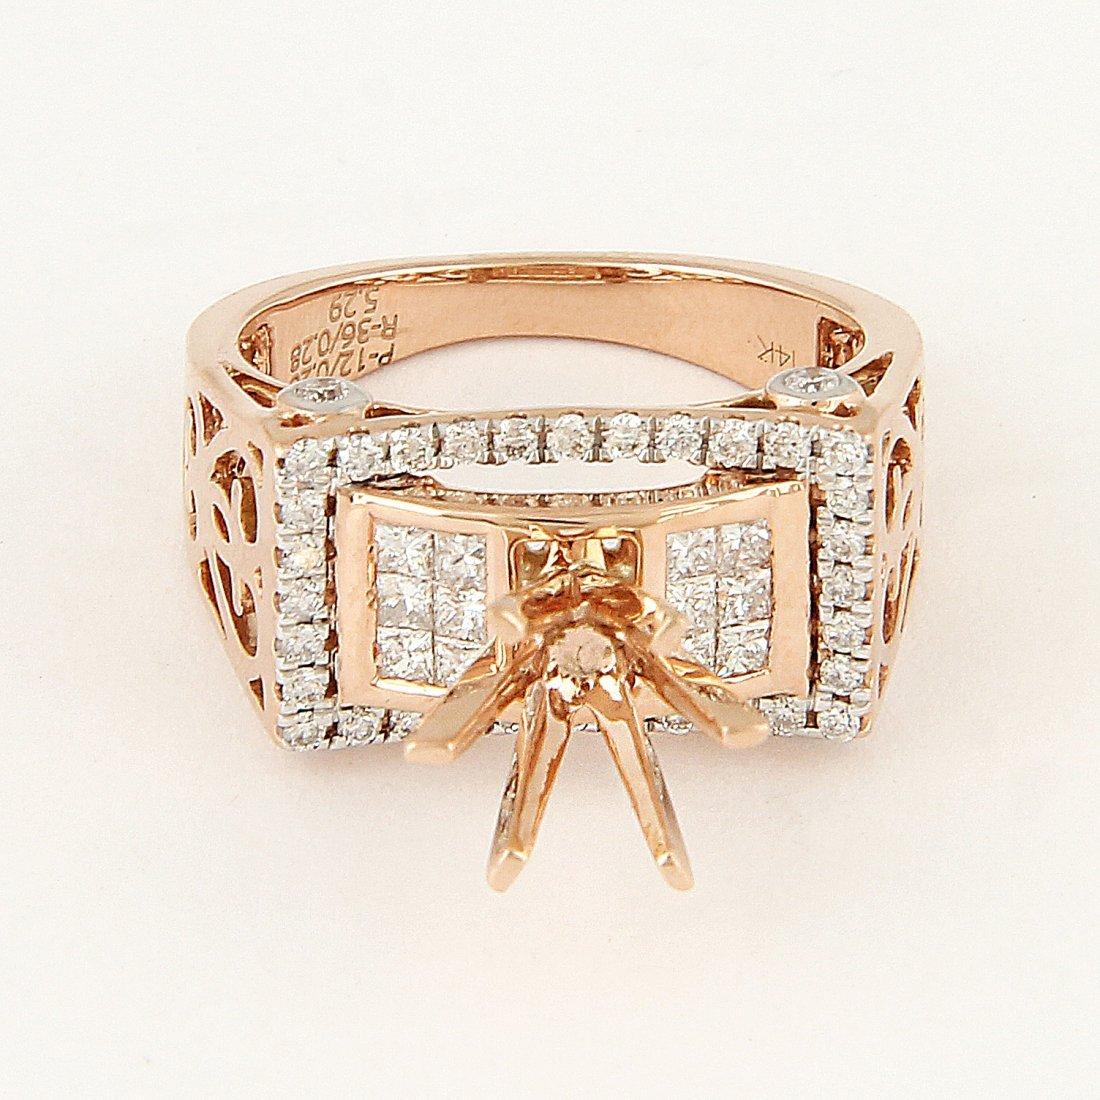 14 K Rose Gold Diamond Ring - Center stone unmounted